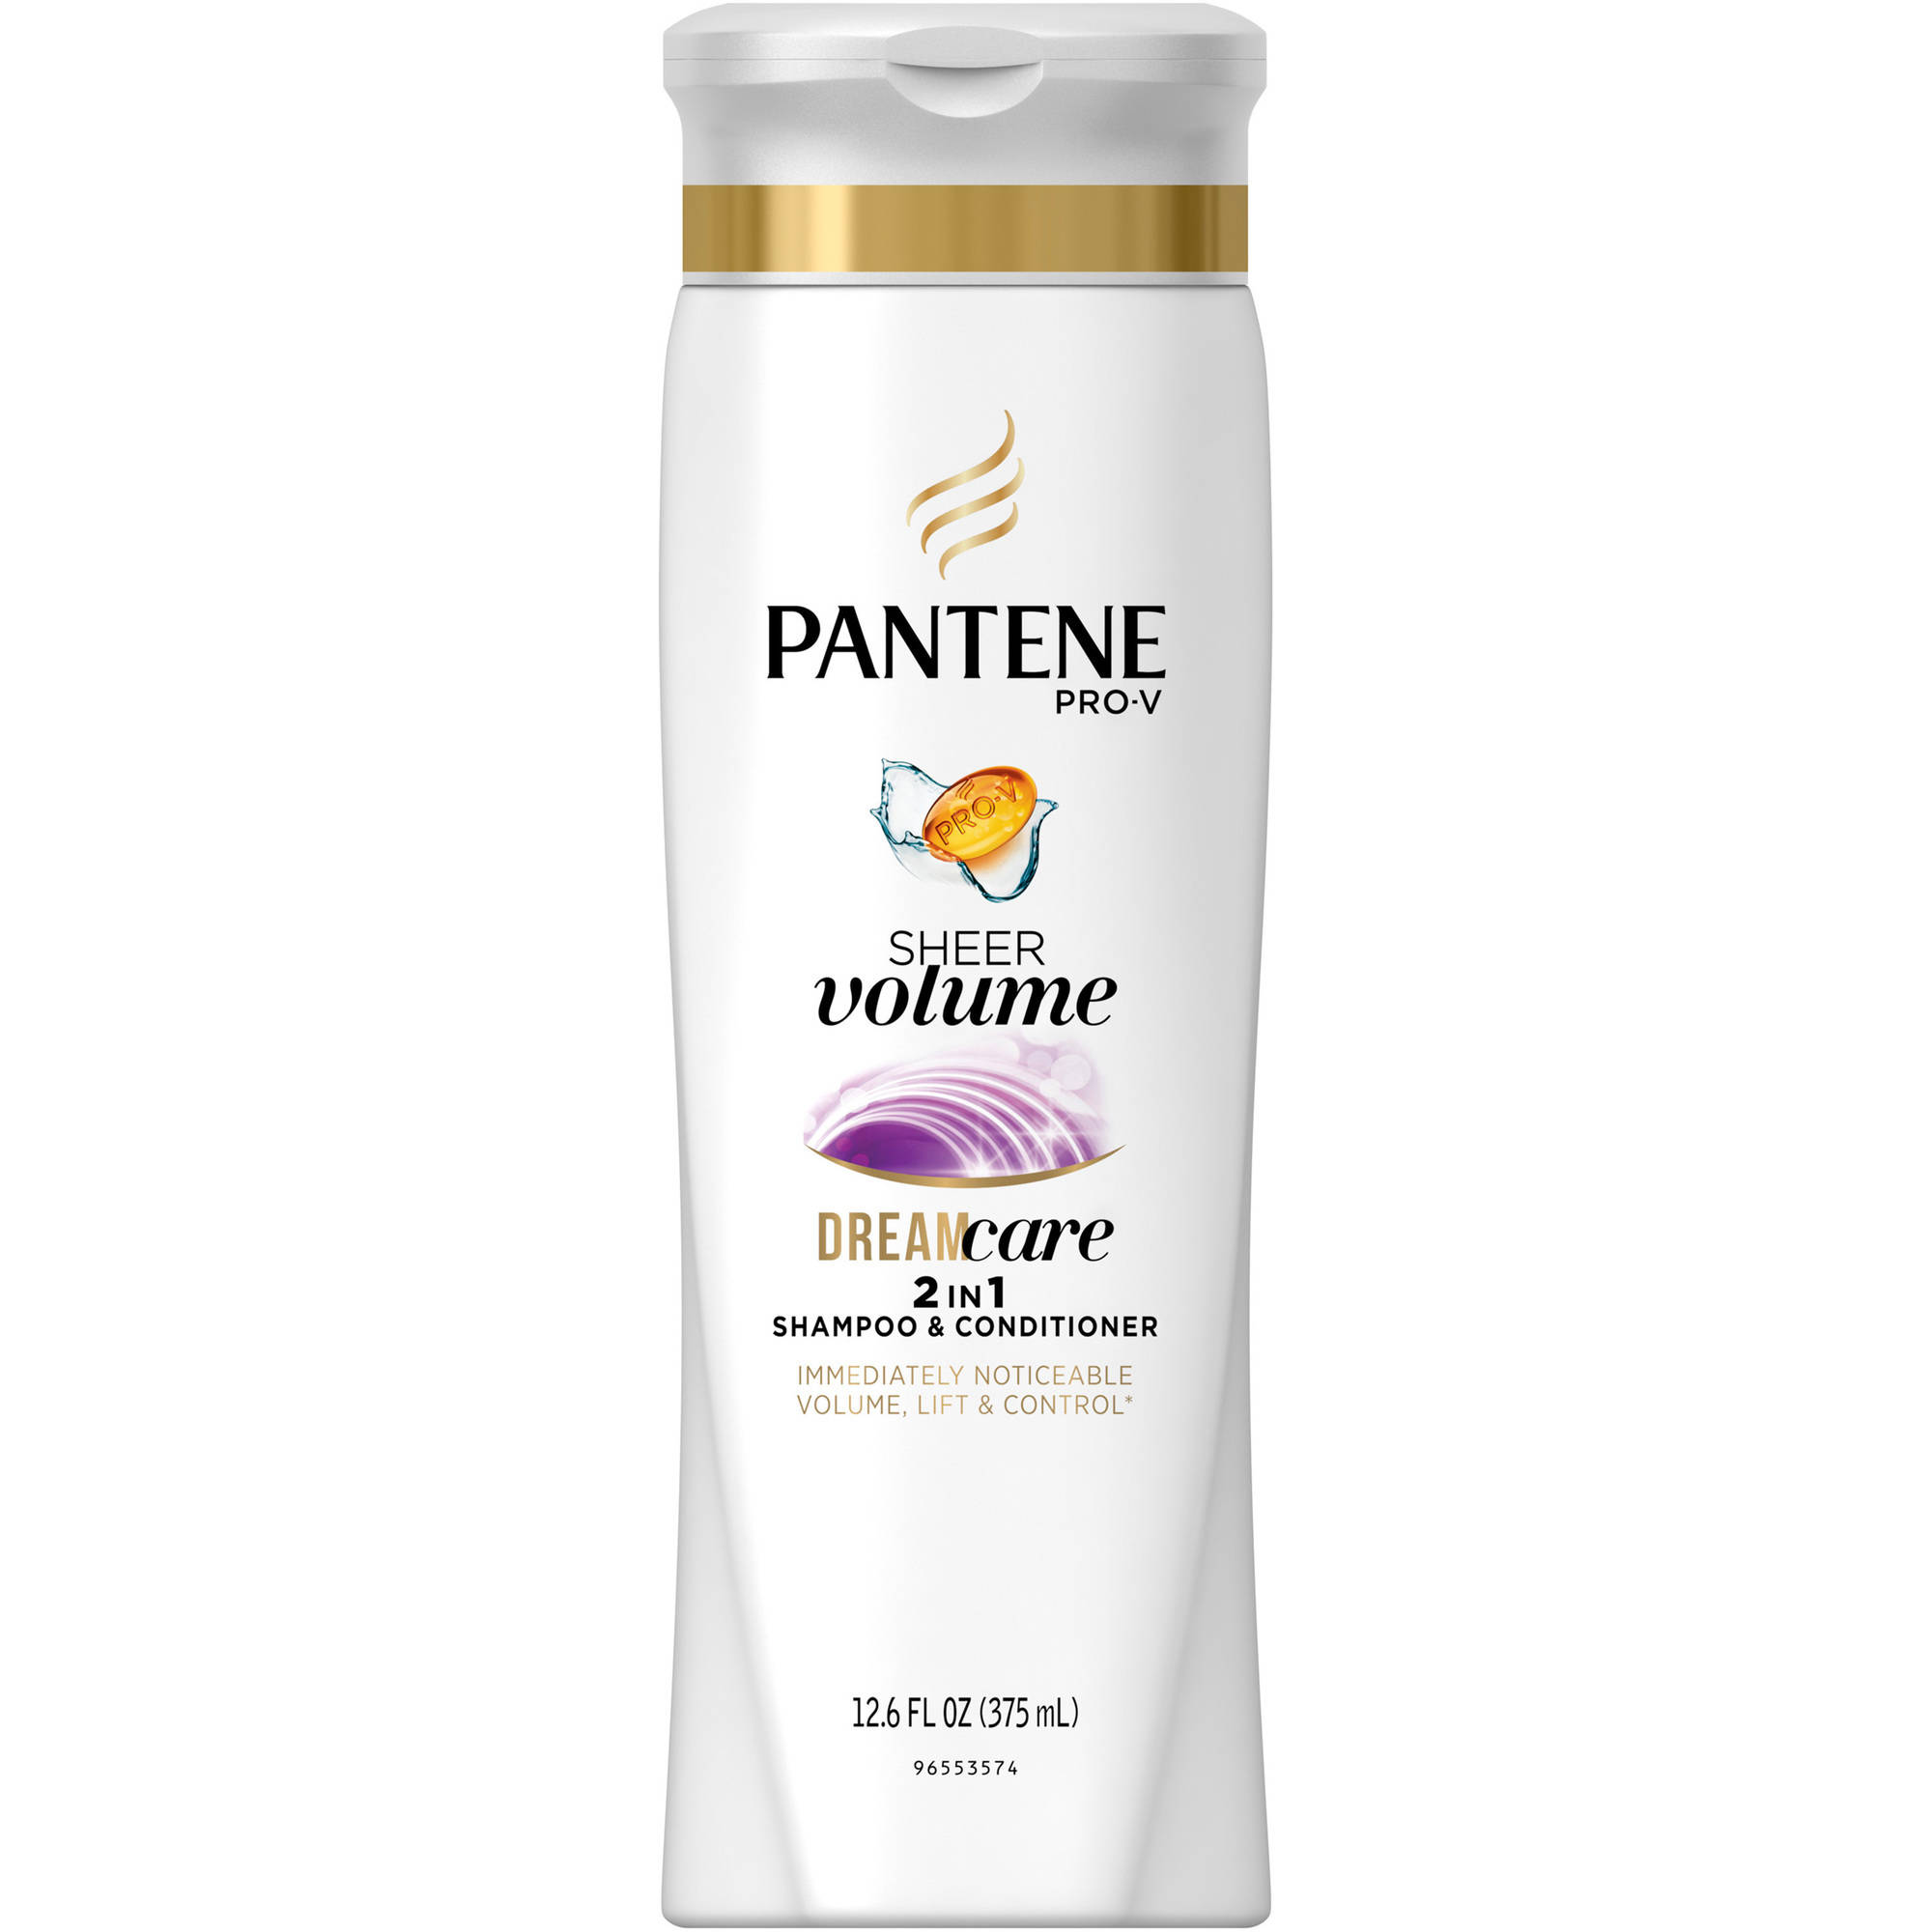 Pantene Pro-V Sheer Volume 2 in 1 Shampoo & Conditioner, 12.6 fl oz